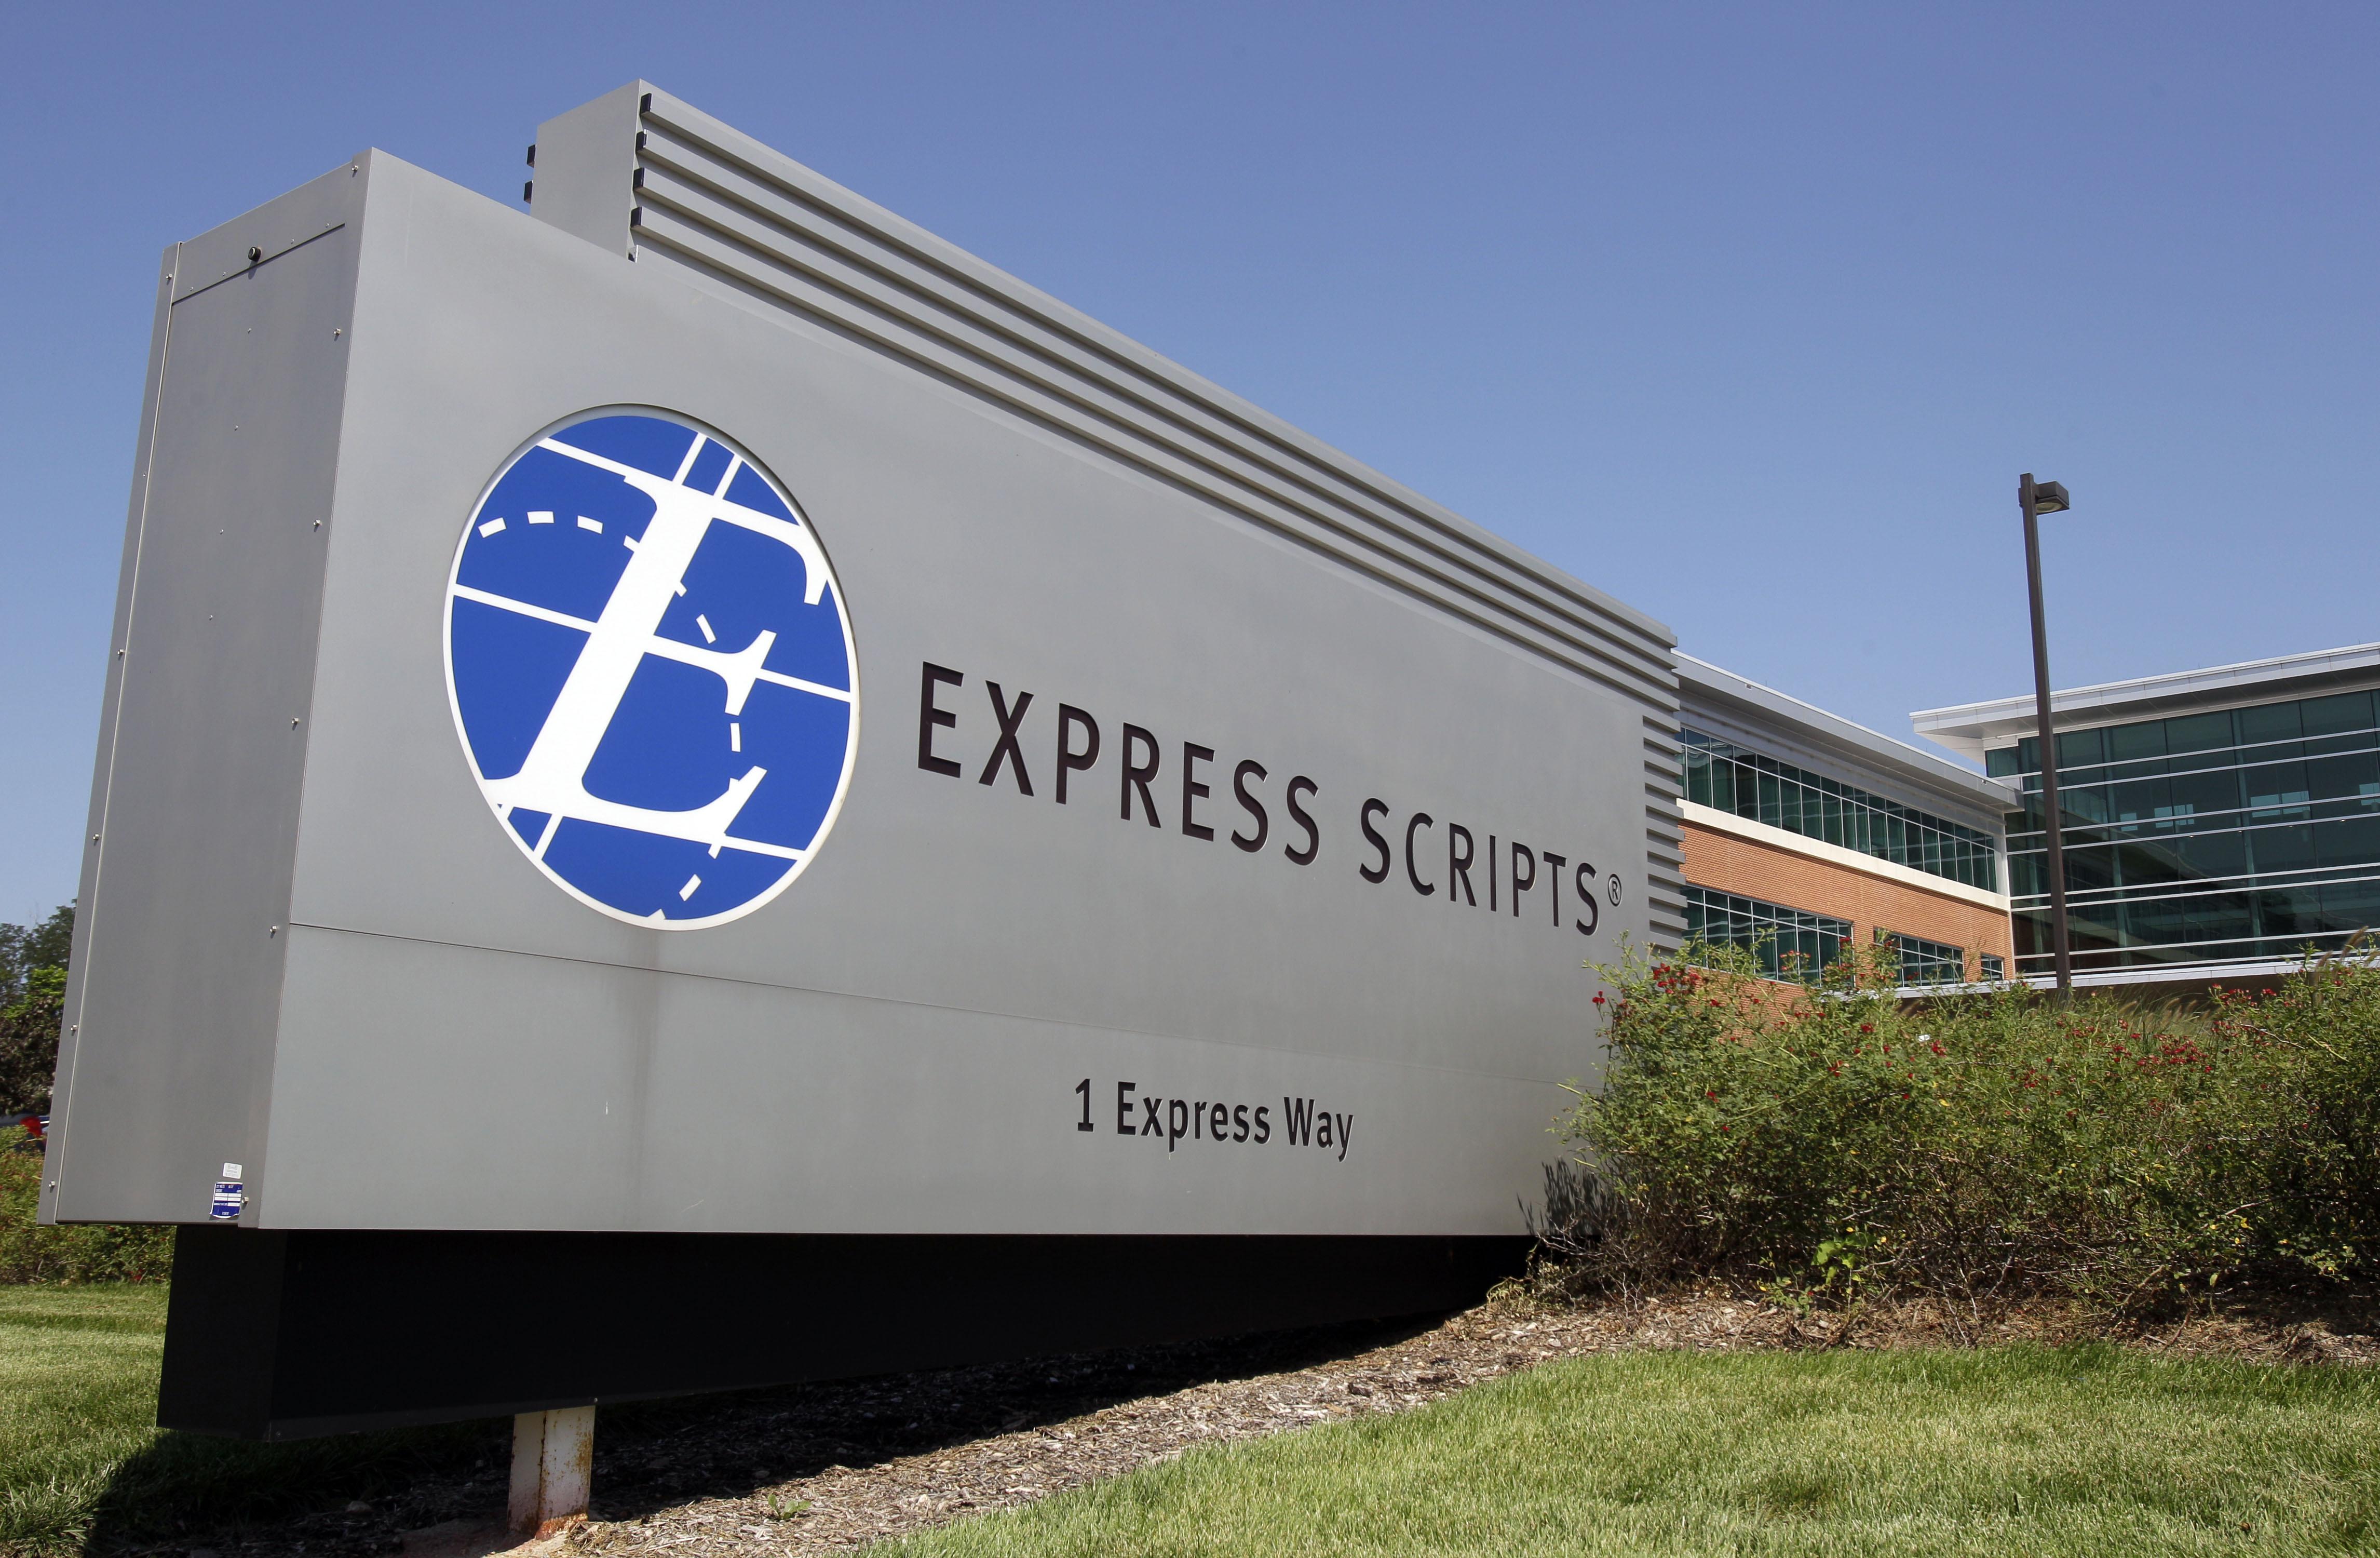 Express Scripts offers $1 alternative to $750 Daraprim pill from